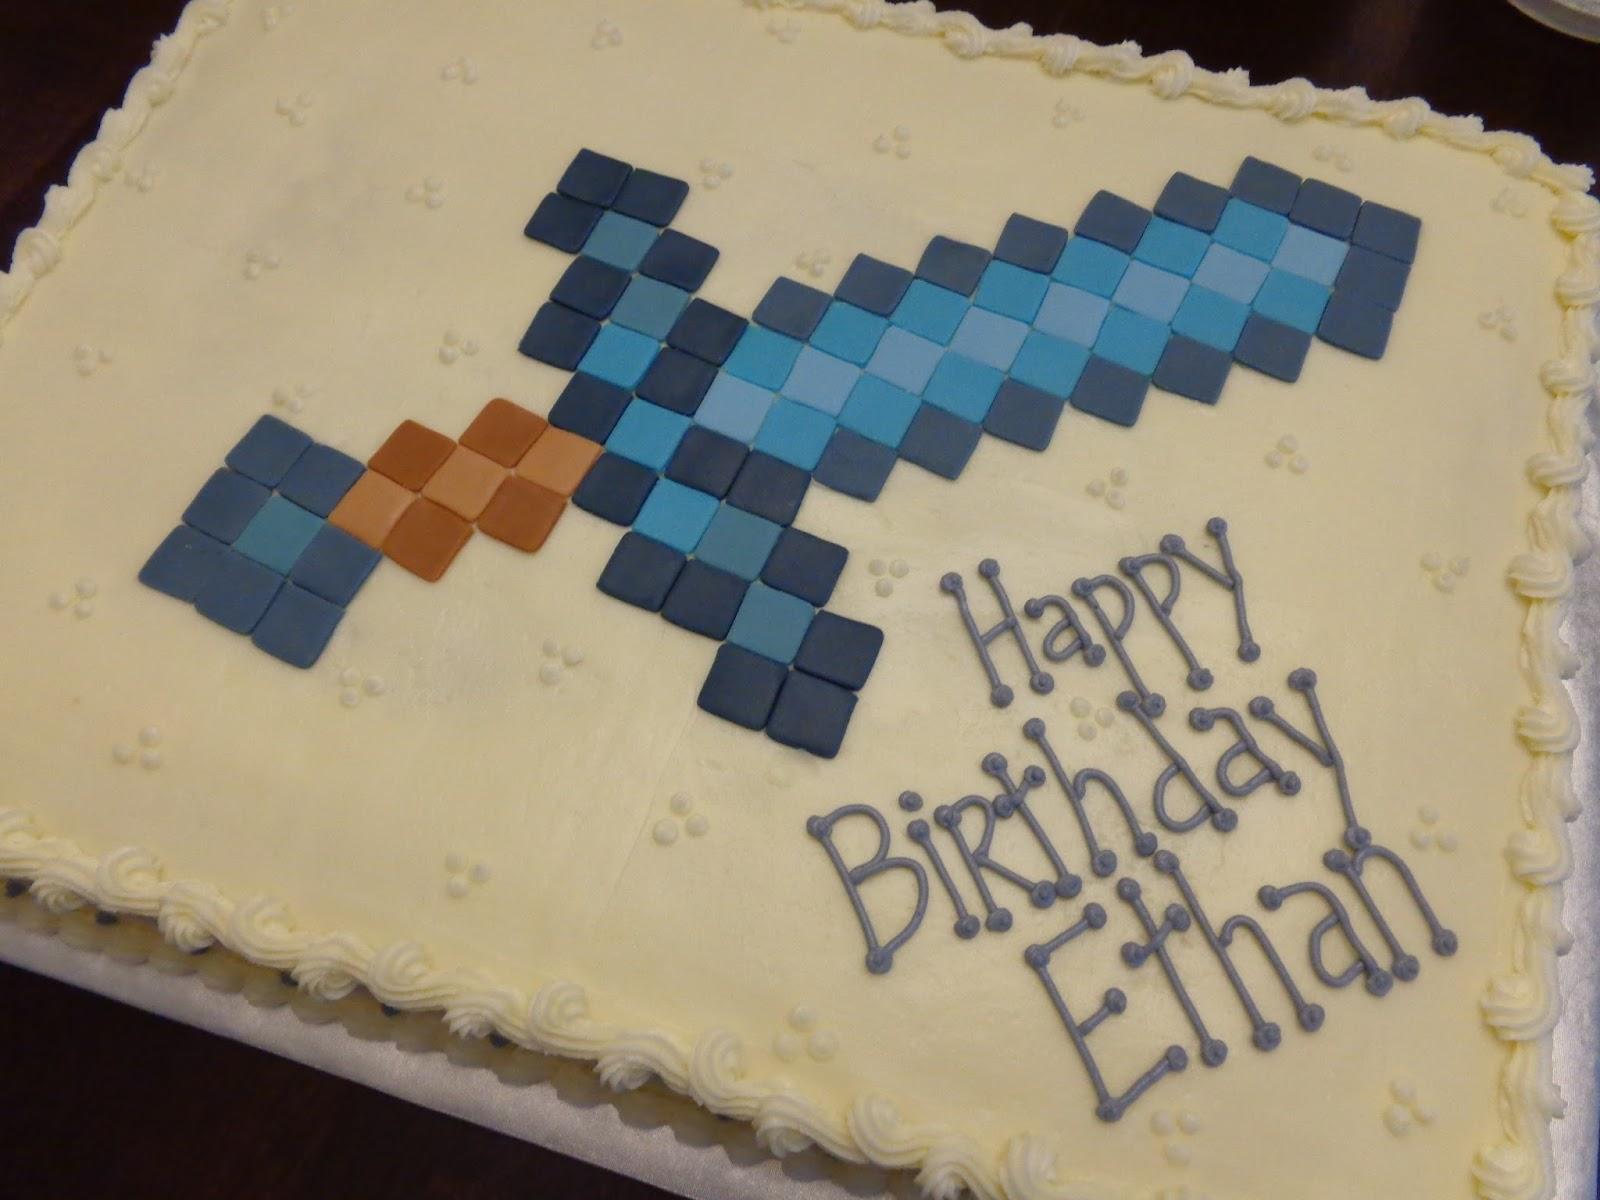 Minecraft Sword Cake Images : Minecraft Diamond Sword Cake Ideas and Designs